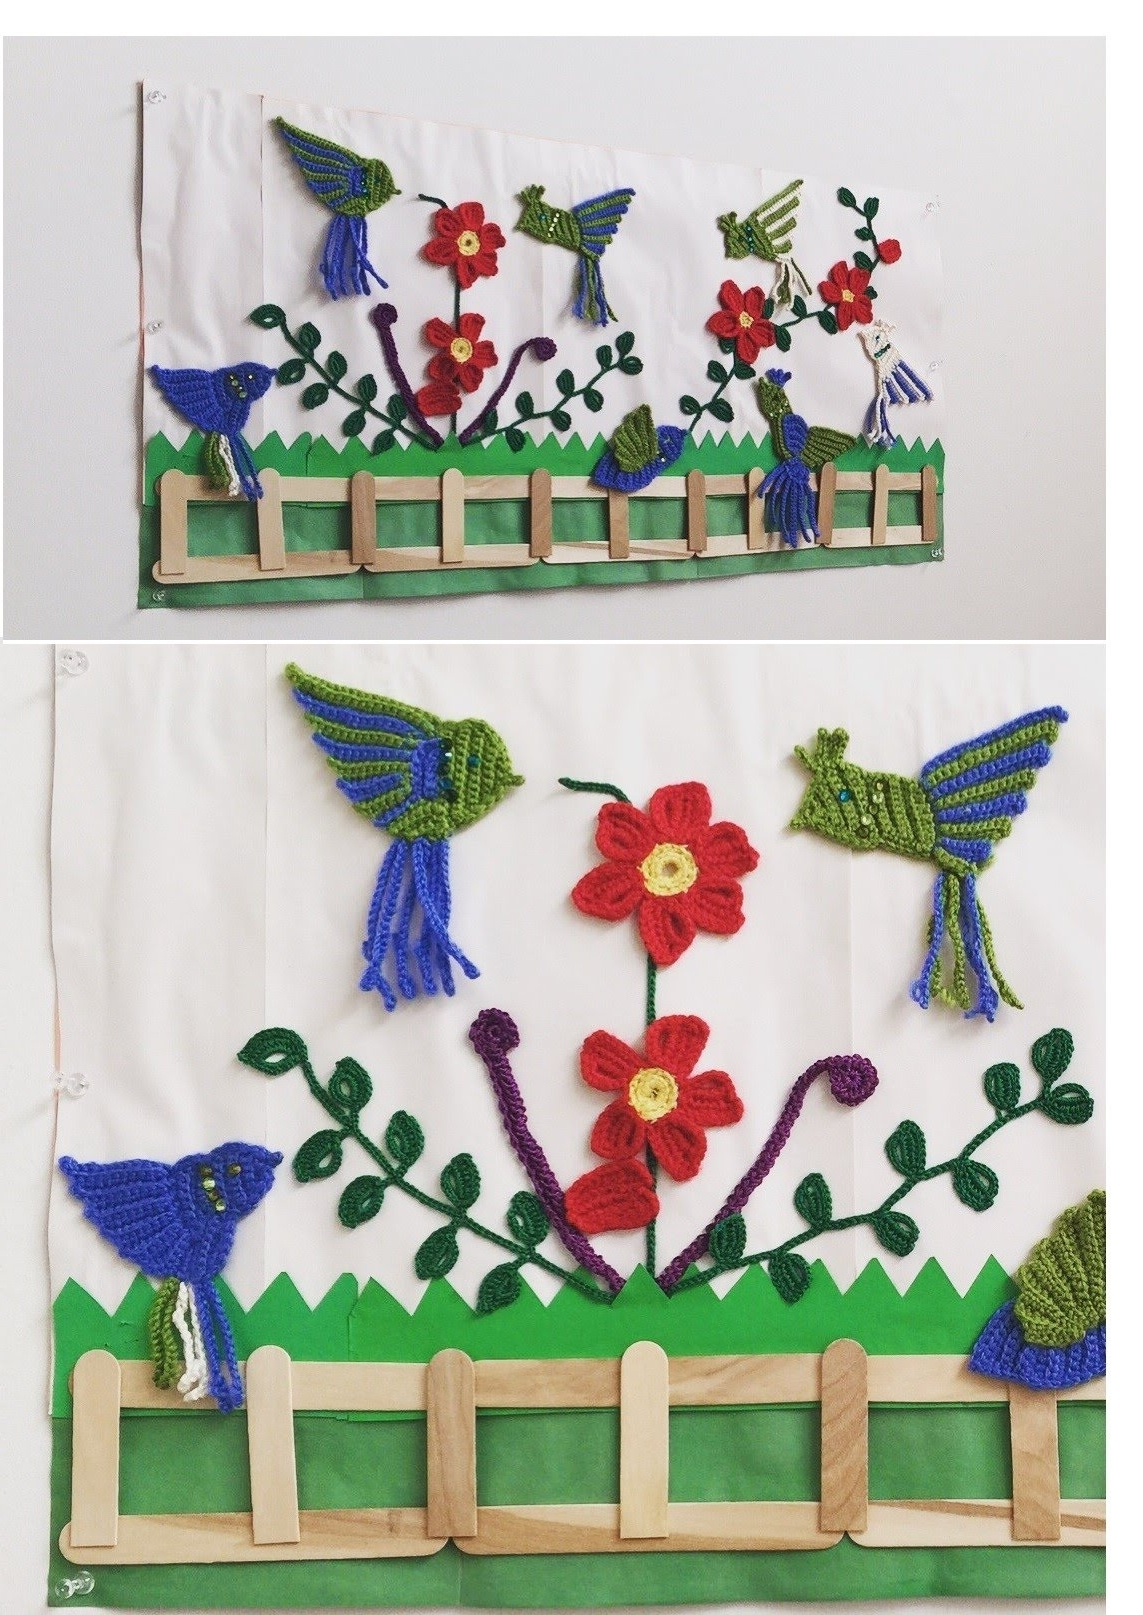 Trendy Crochet Appliques – Crochet Wall Decor – Youtube For Crochet Wall Art (View 8 of 20)